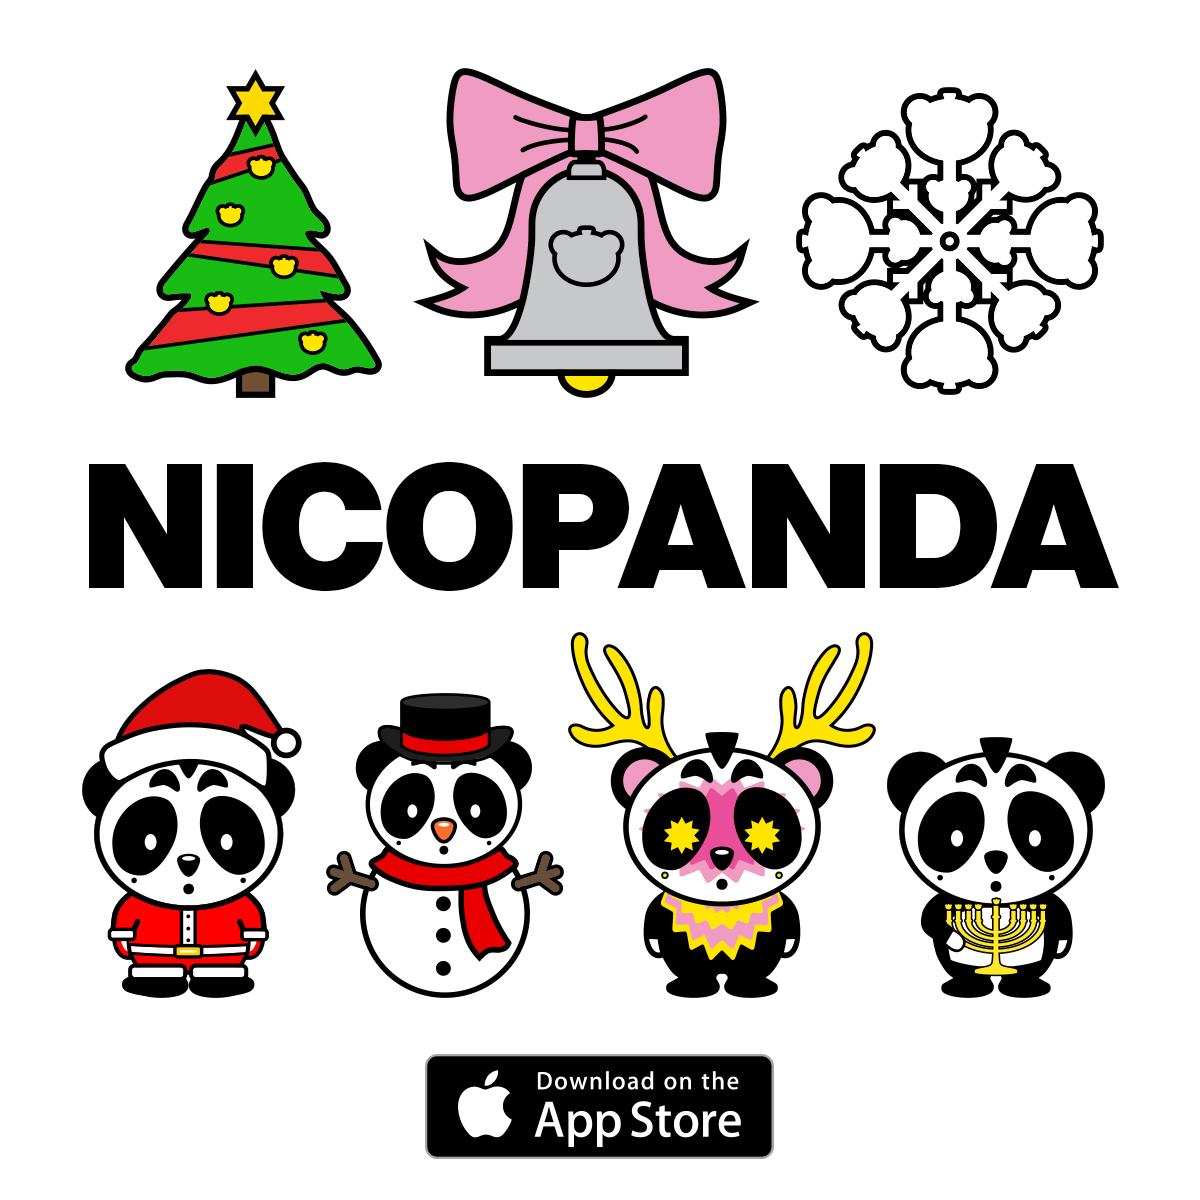 NICOPANDA Holiday Stickapax Update